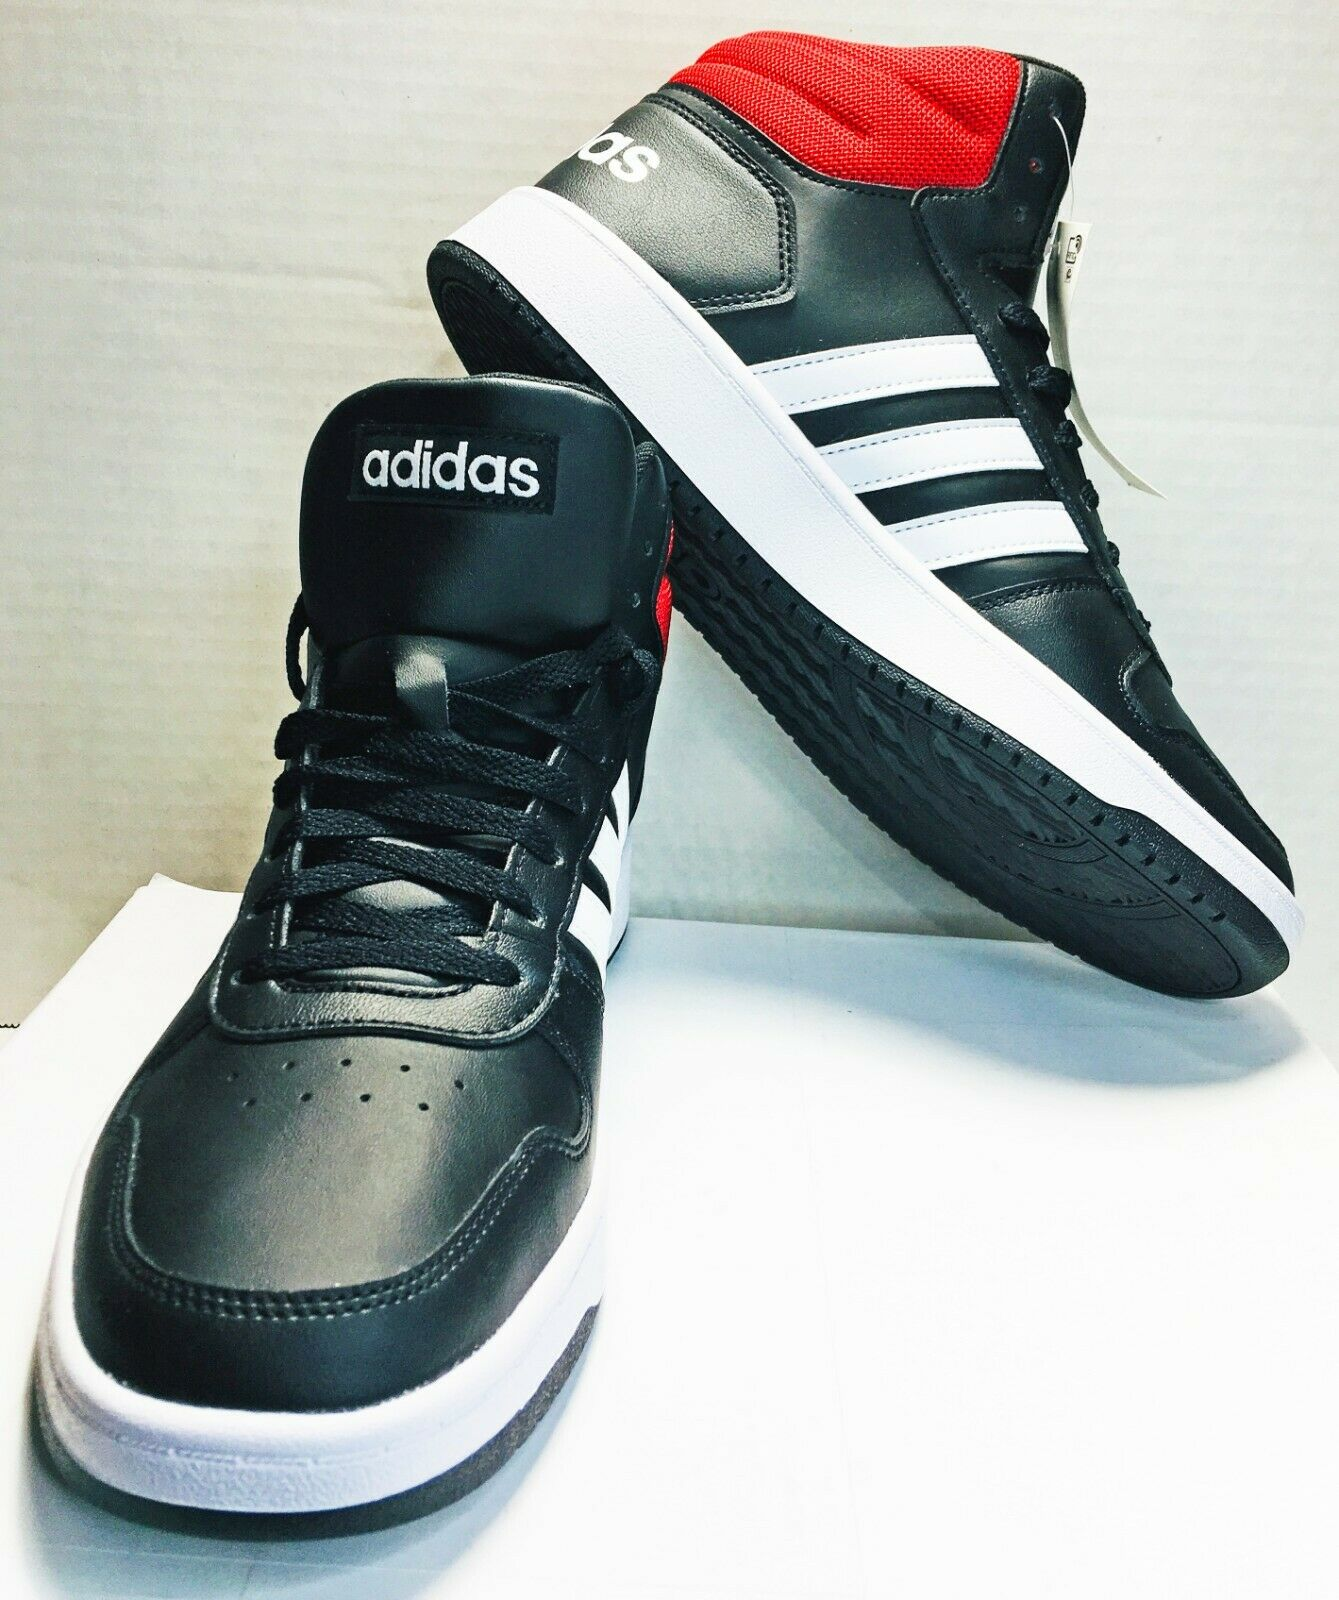 Adidas Hoops 2.0 mid women Chaussures Originals baskets High Top Sneaker ee7857